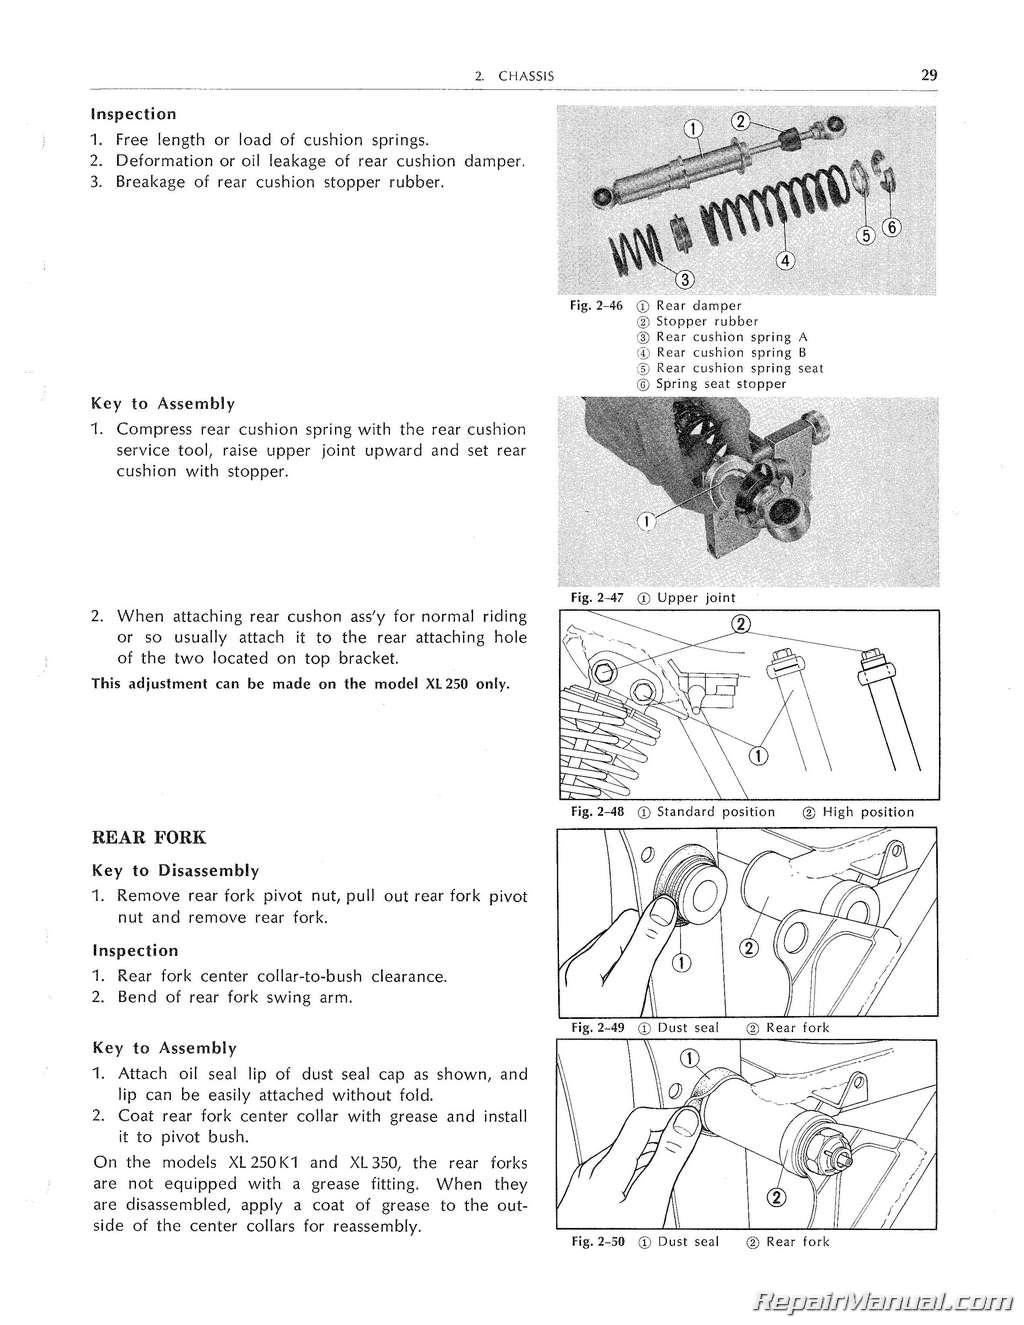 Honda Xl250 Xl350 Service Manual